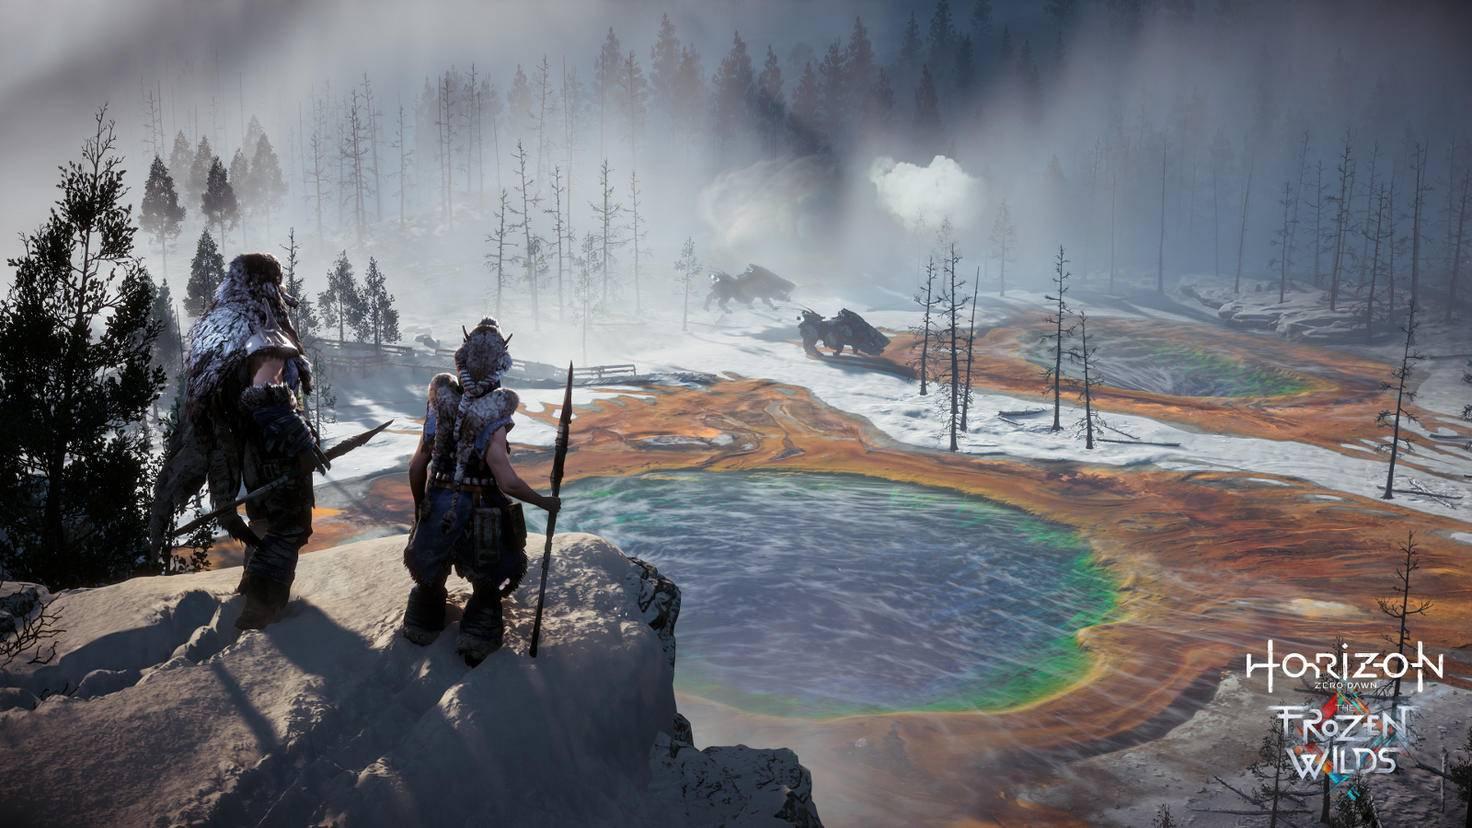 Horizon Zero Dawn Blauglanz Karte.Horizon Zero Dawn The Frozen Wilds Alle 6 Tierfiguren Finden